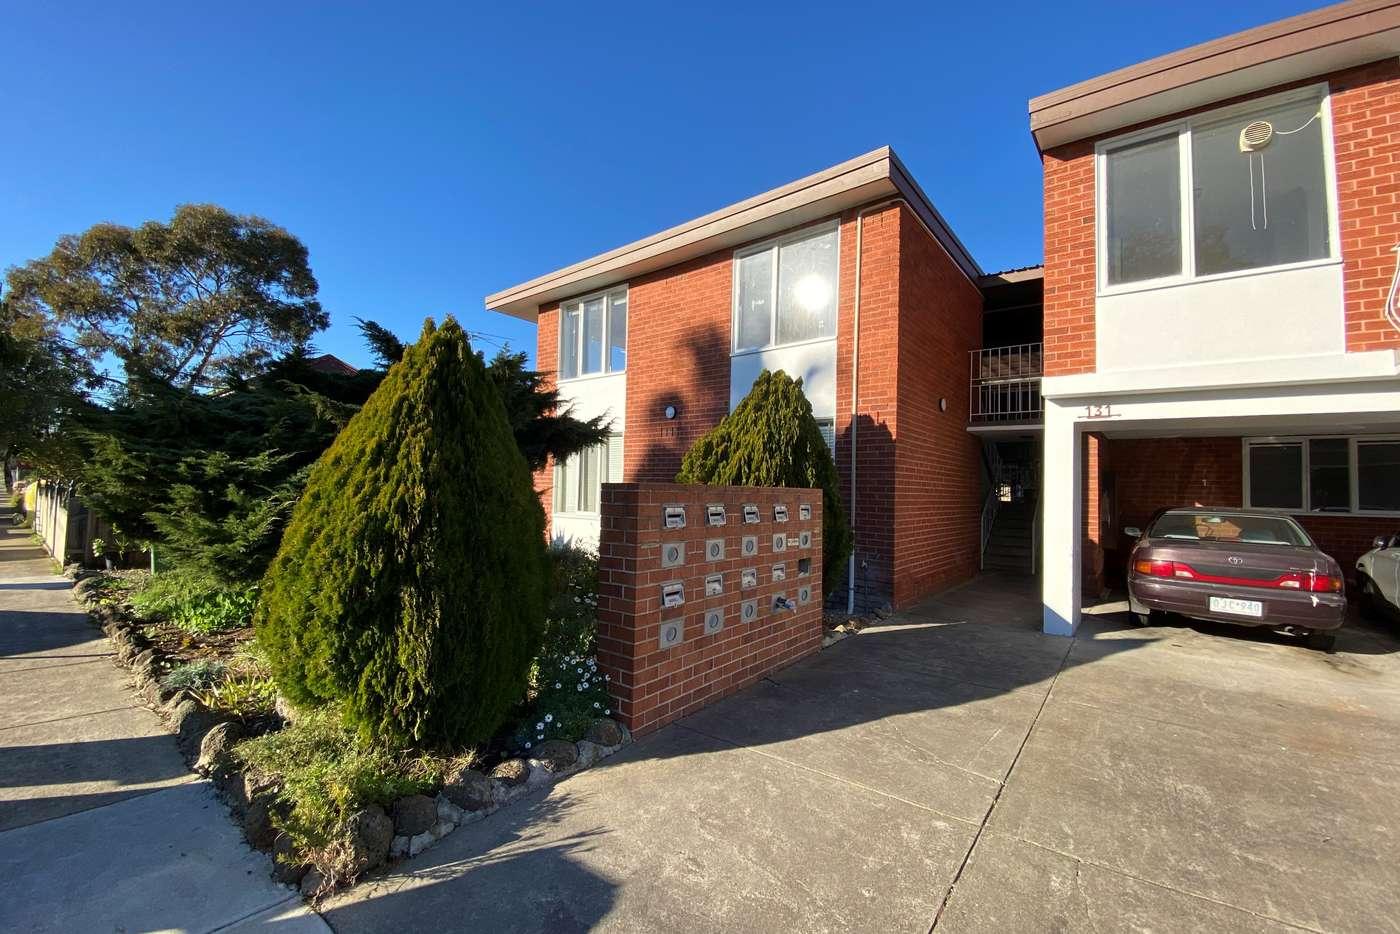 Main view of Homely apartment listing, 6/131 Emmaline Street, Northcote VIC 3070